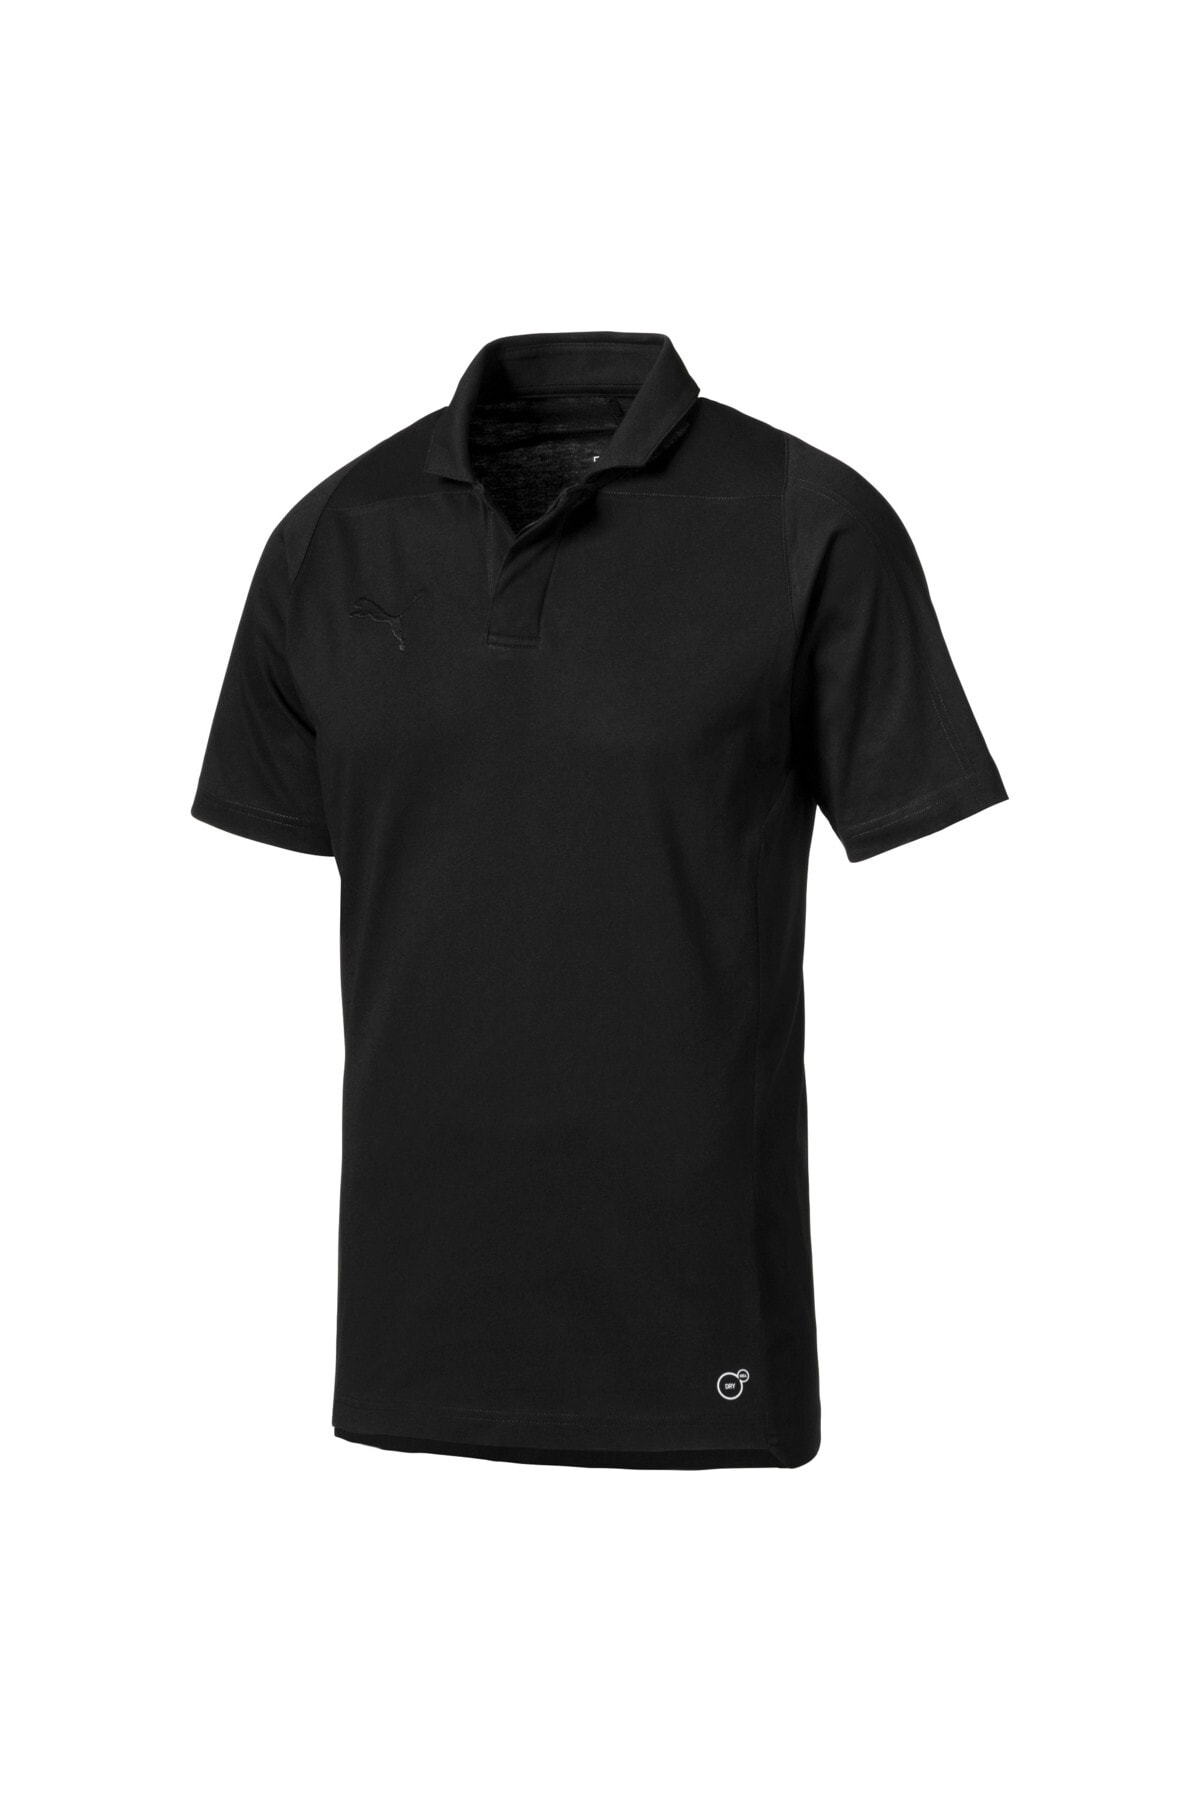 Puma Fınal Kısa Kollu Erkek Futbol Polo T-shirt